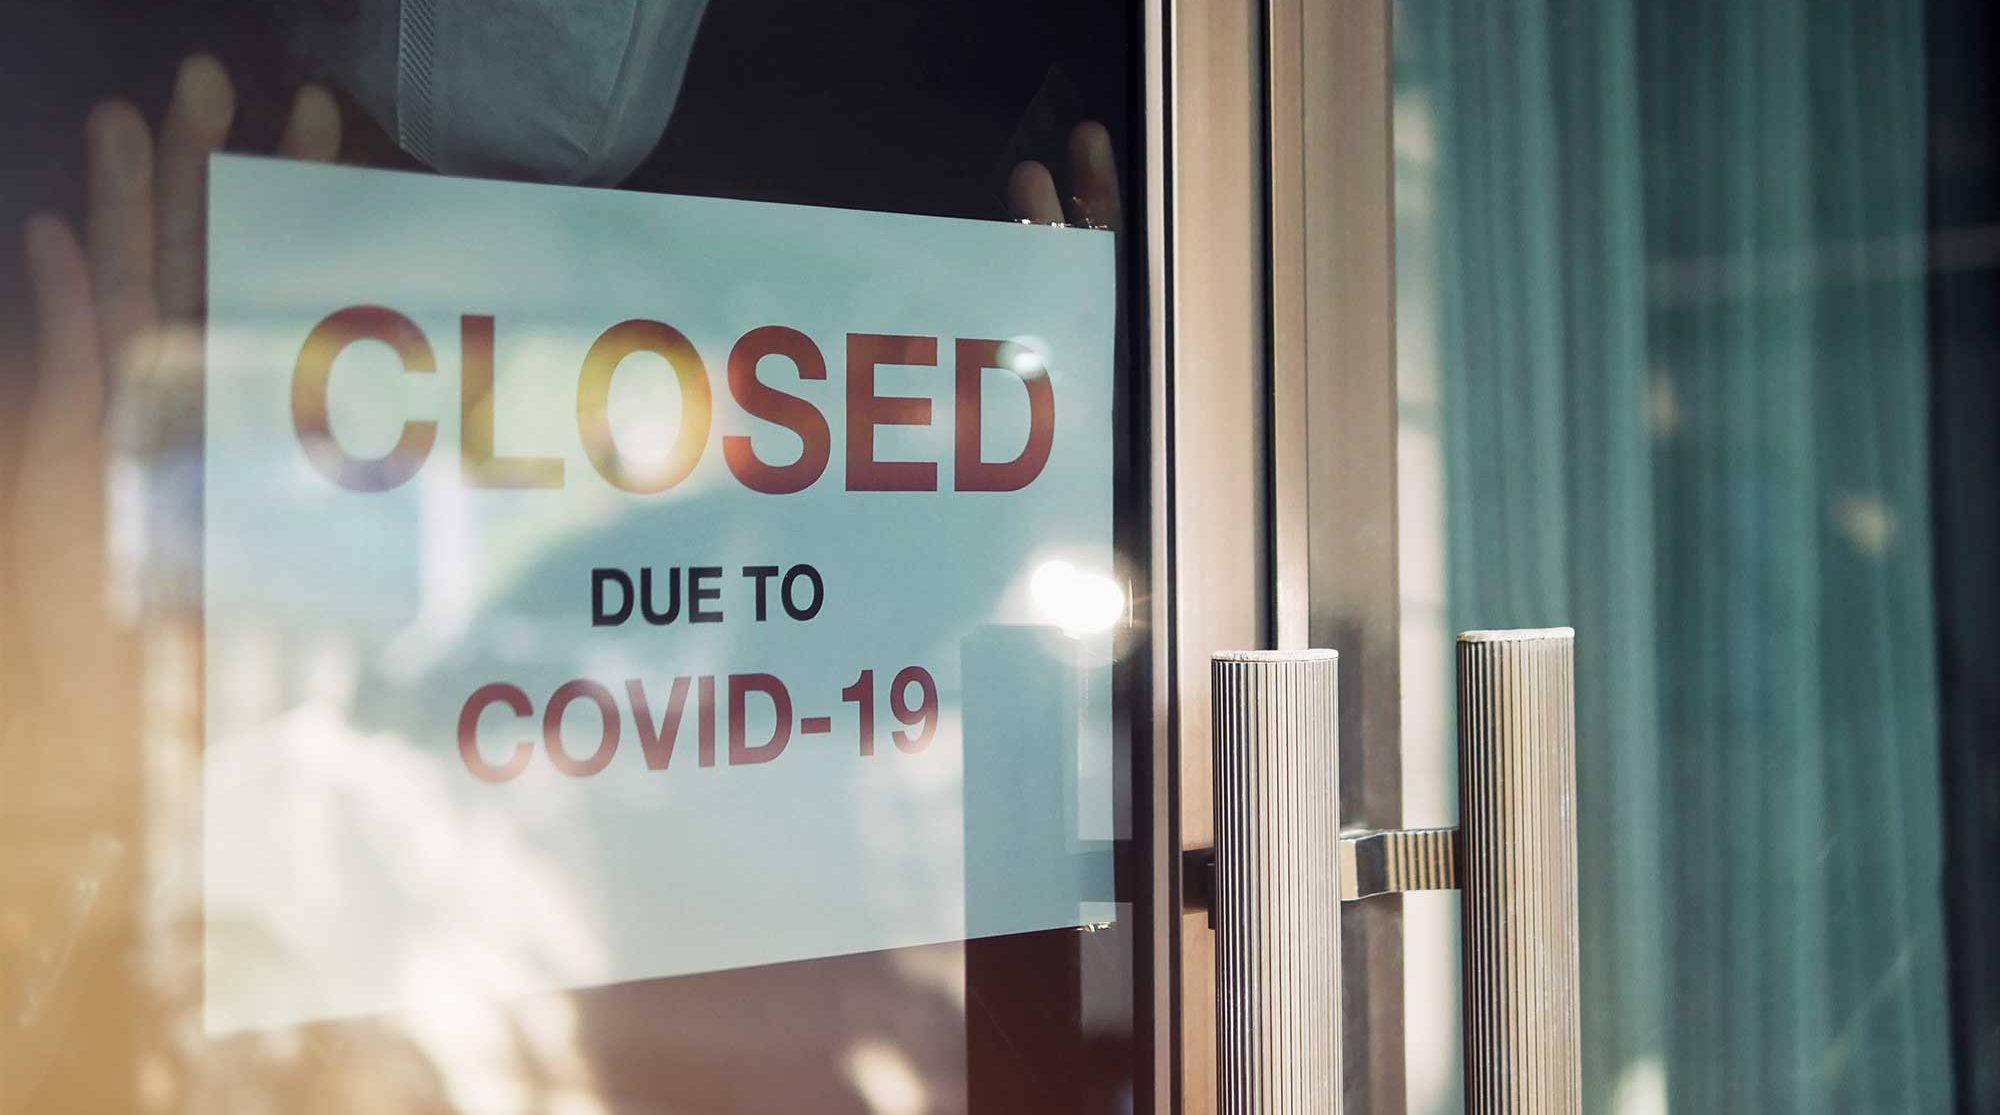 COVID-19 closed sign